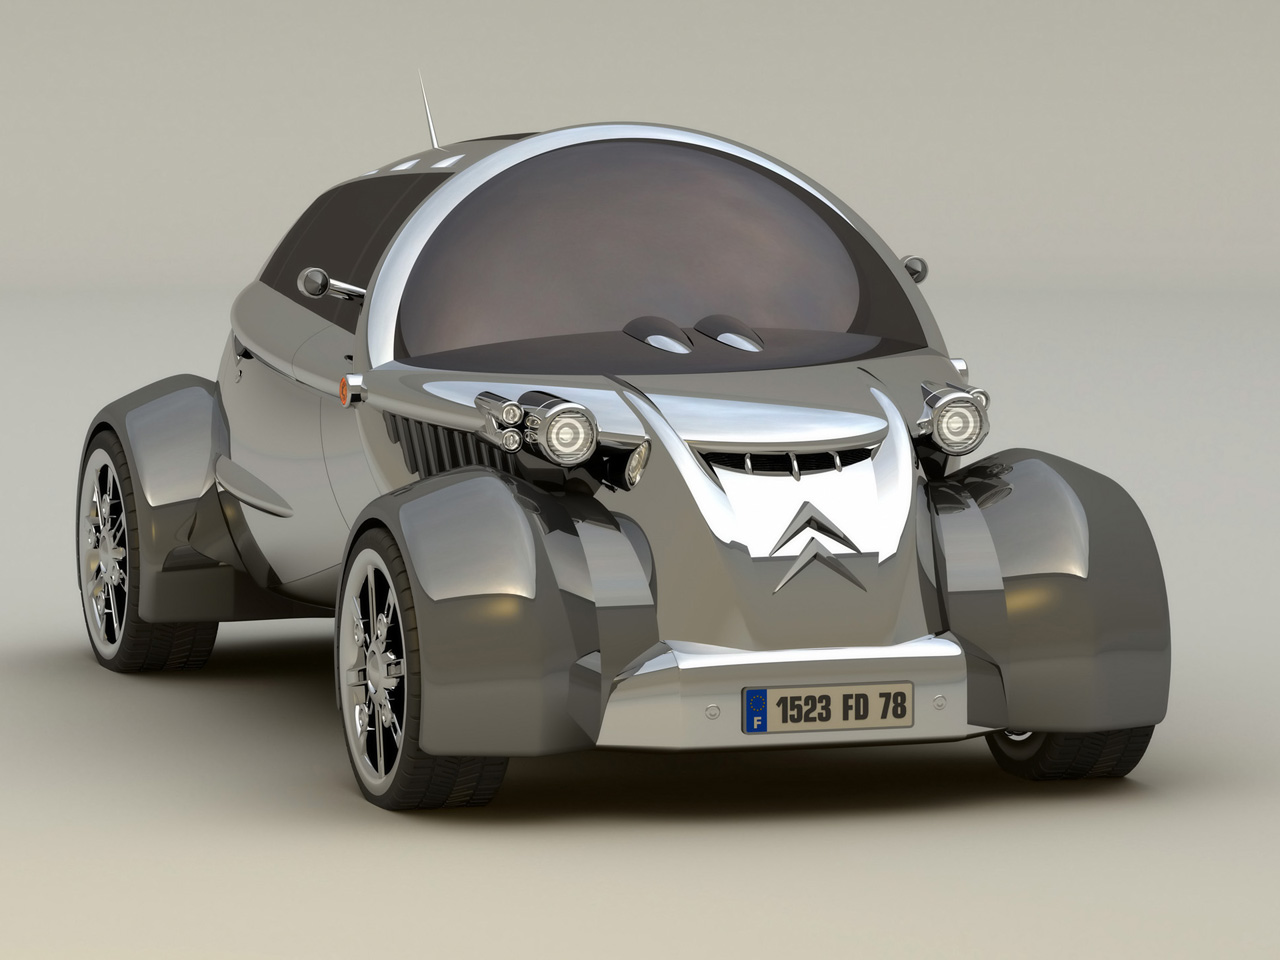 2008 citroen 2cv concept design wallpapers by cars. Black Bedroom Furniture Sets. Home Design Ideas